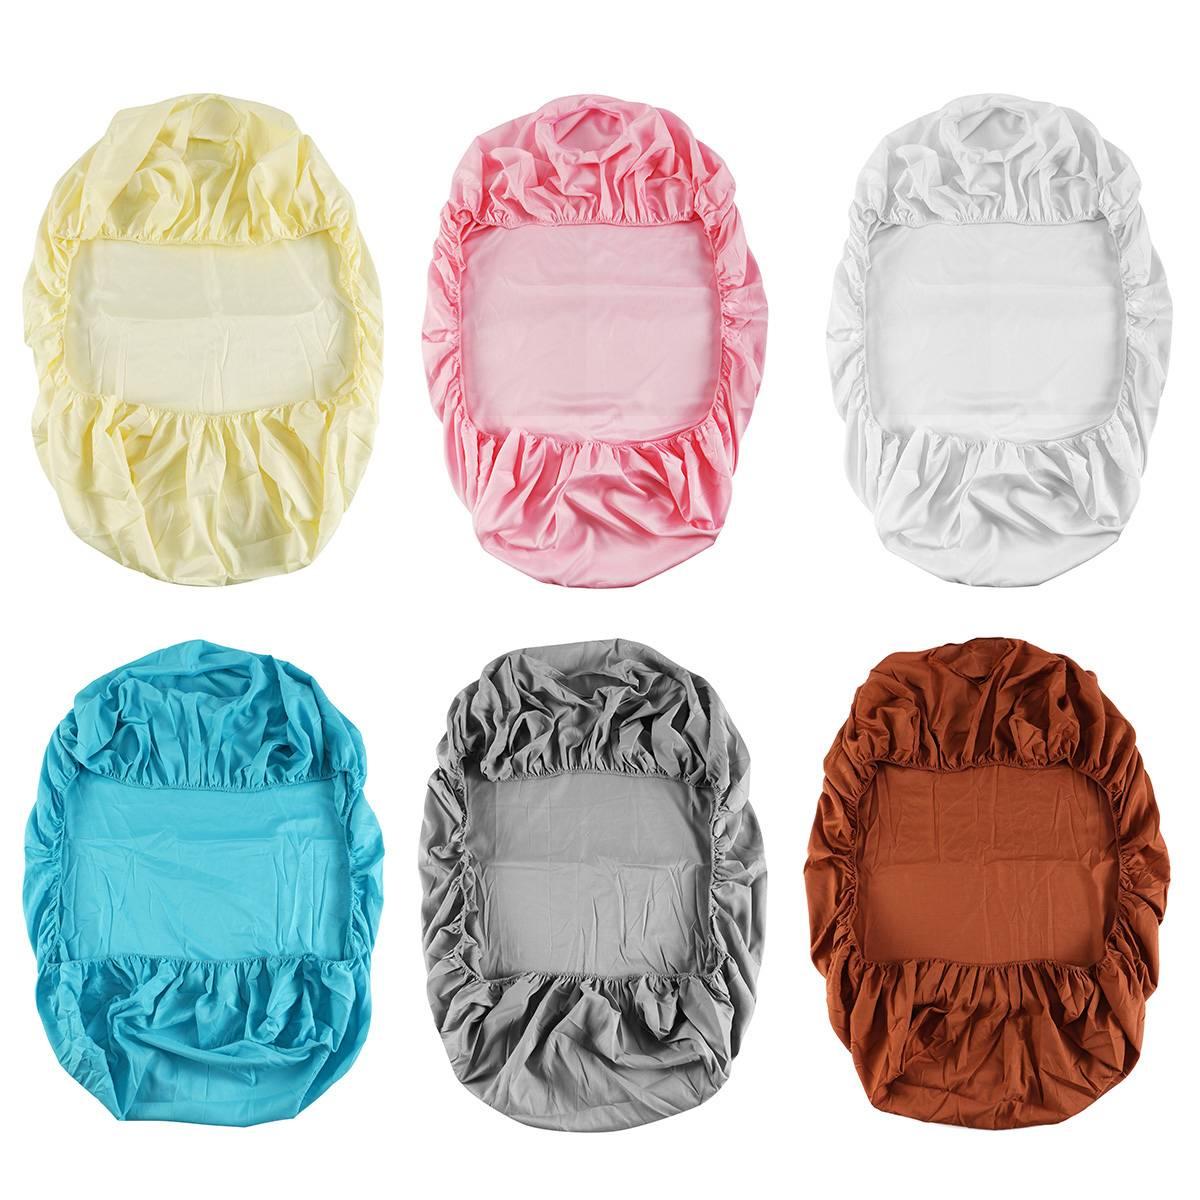 Soft Massage Bed Cover Beauty Salon Massage Sheet Body Spa